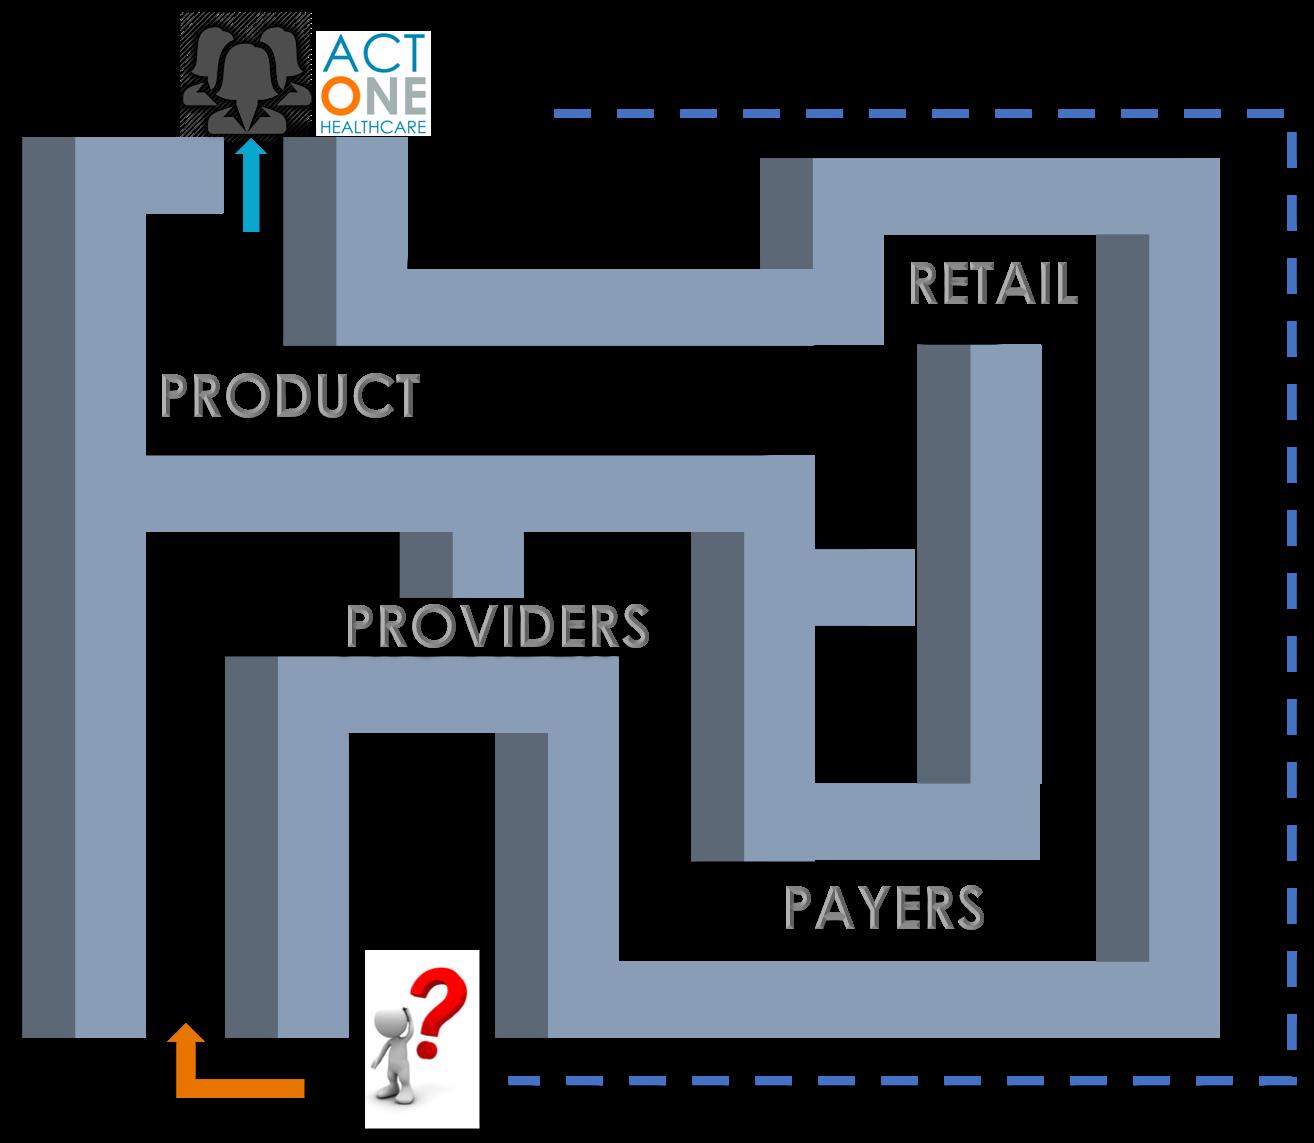 Maze diagram